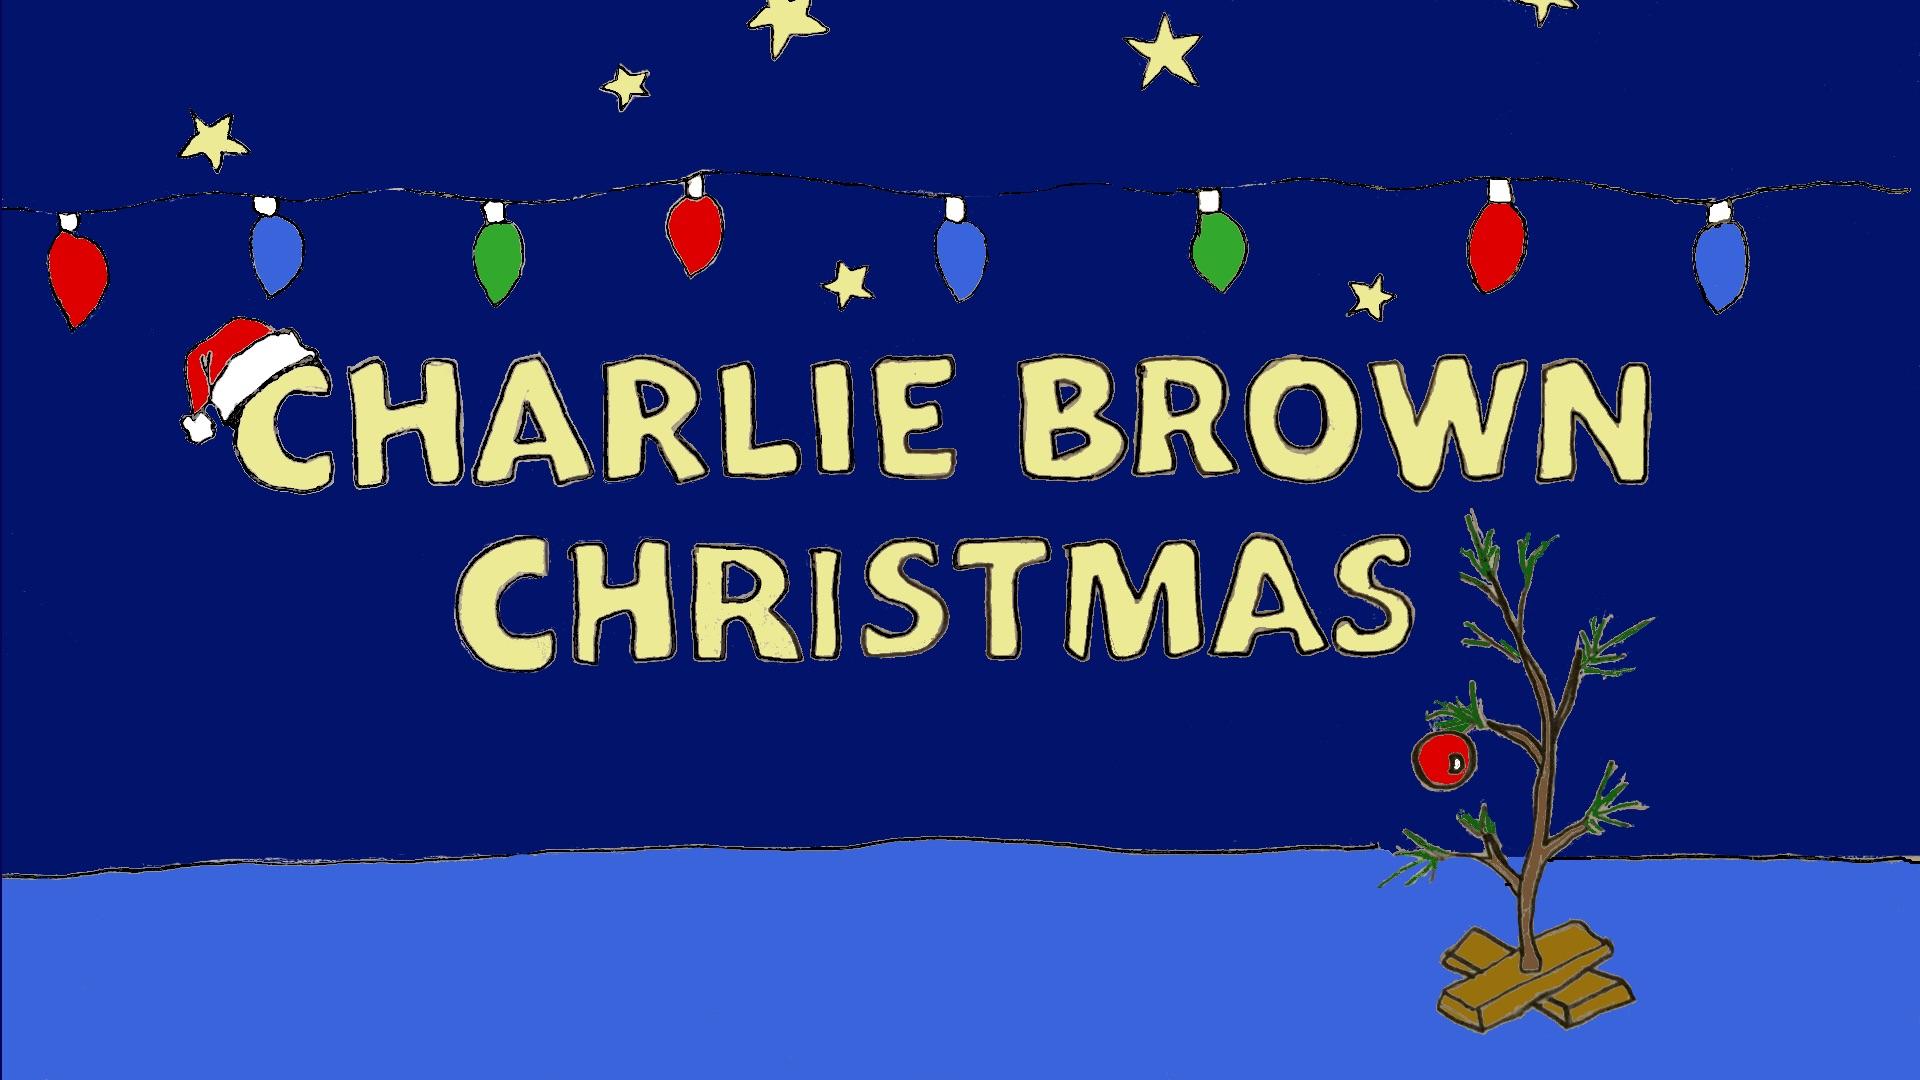 charliebrown.jpg